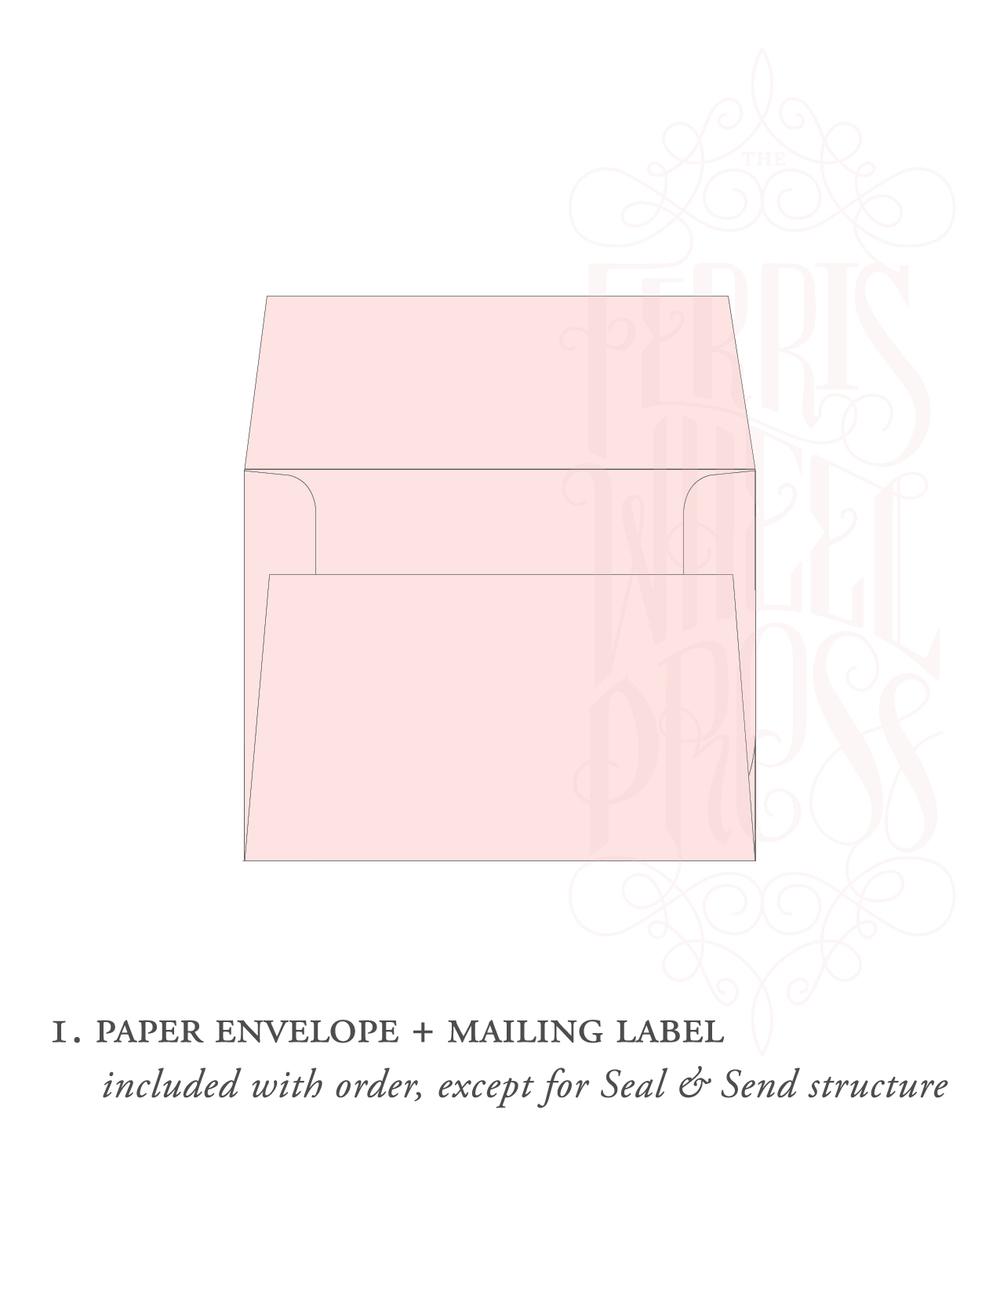 FWP - Envelopements.jpg